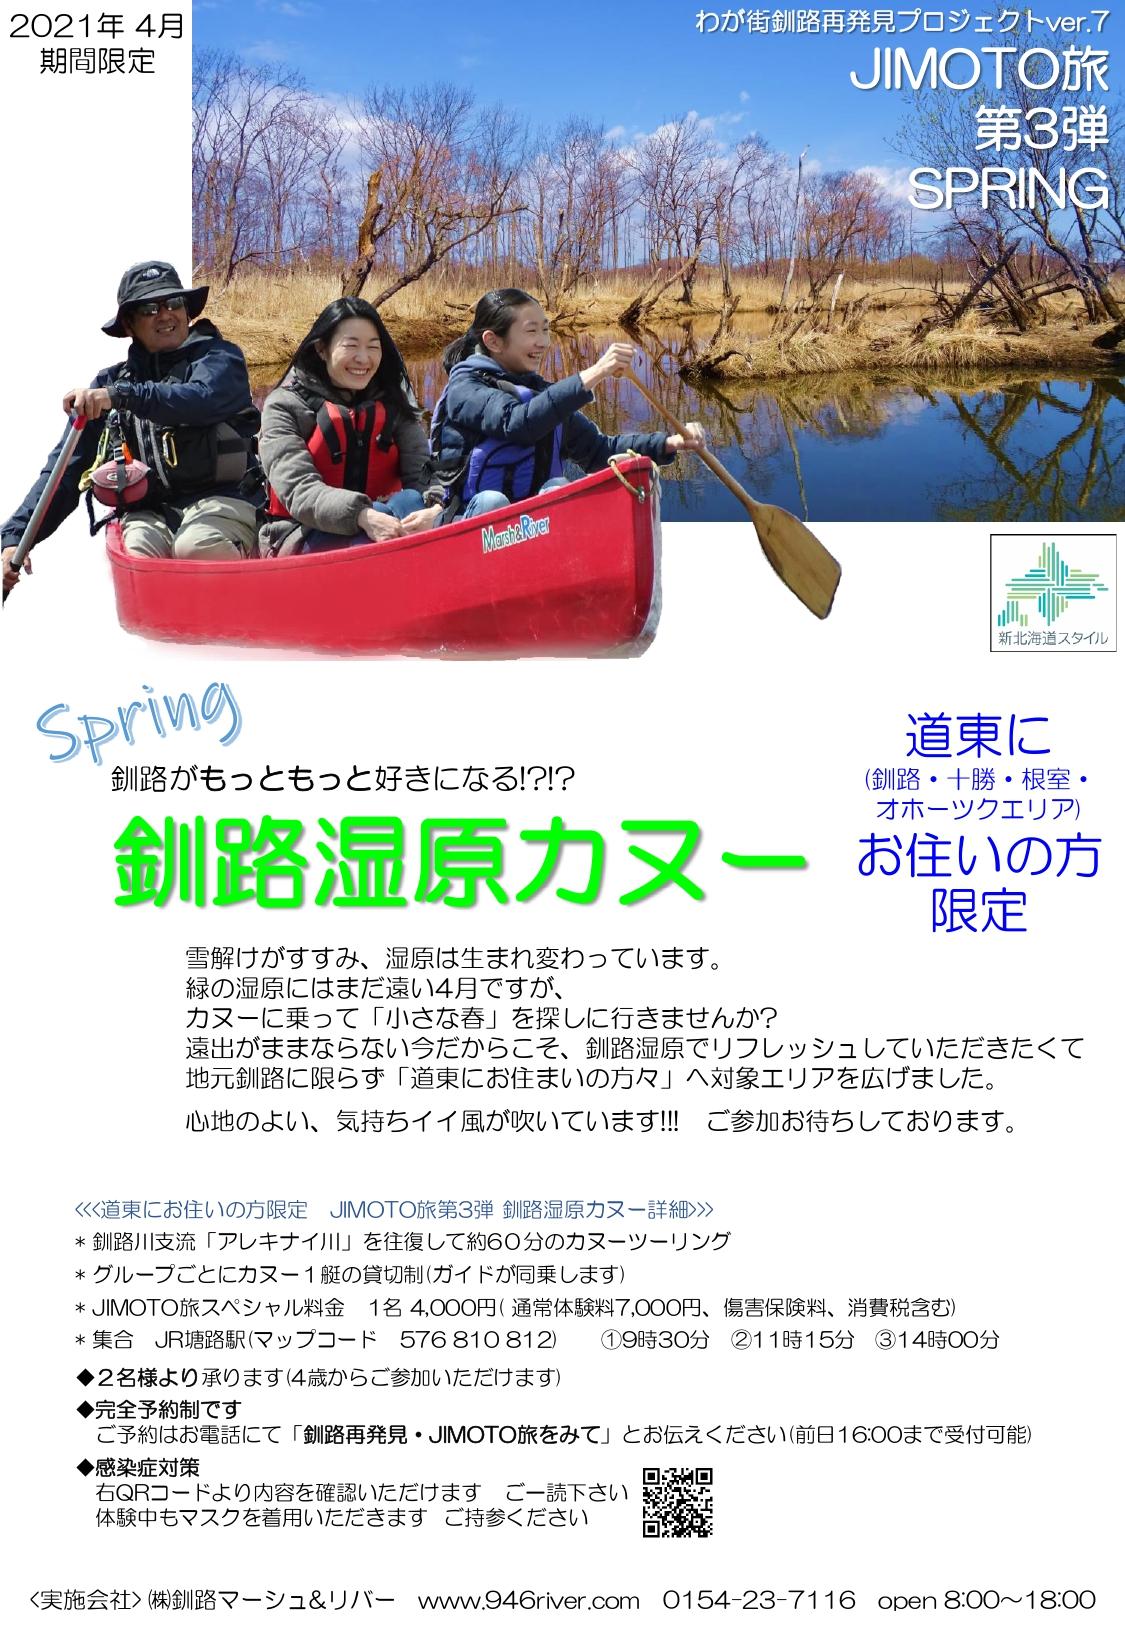 2021釧路再発見JIMOTO旅ver.3_page-0001